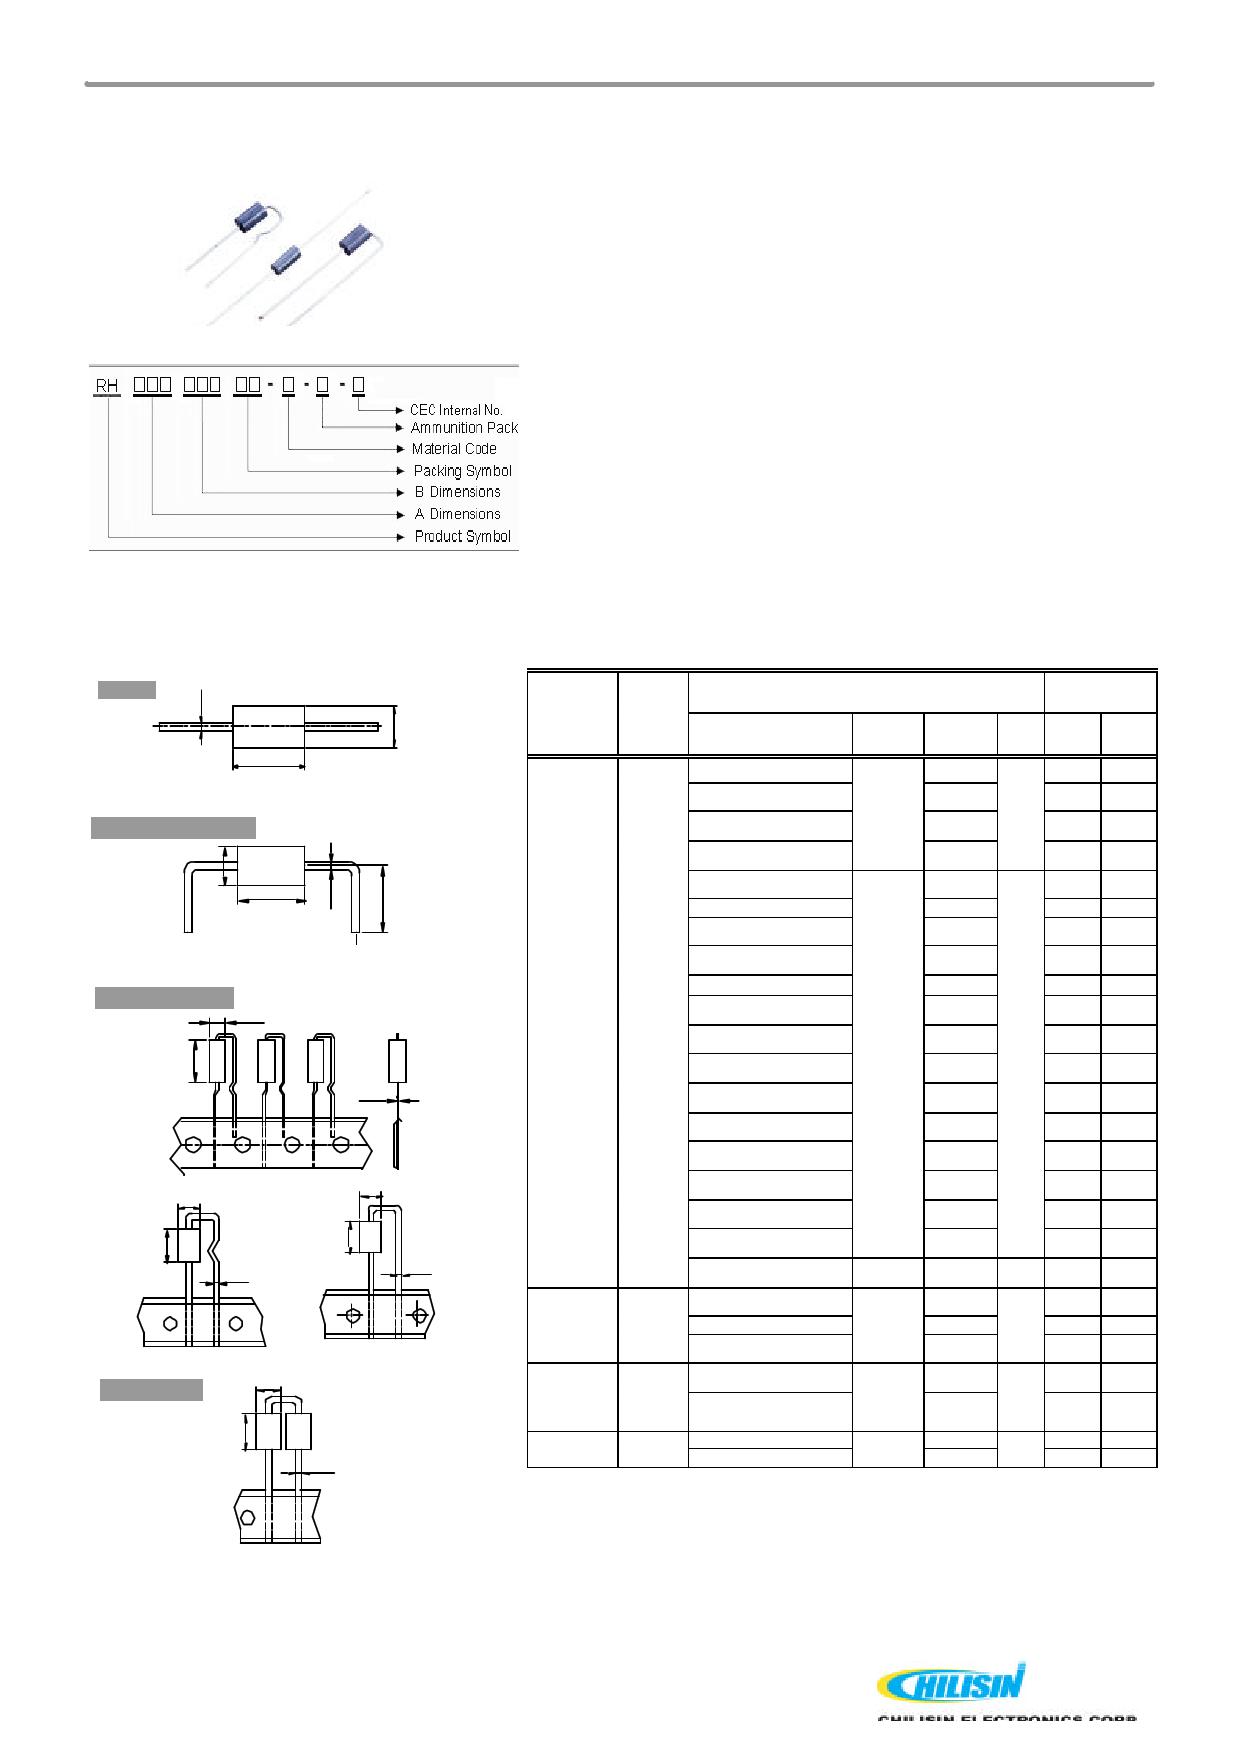 RH035045 데이터시트 및 RH035045 PDF